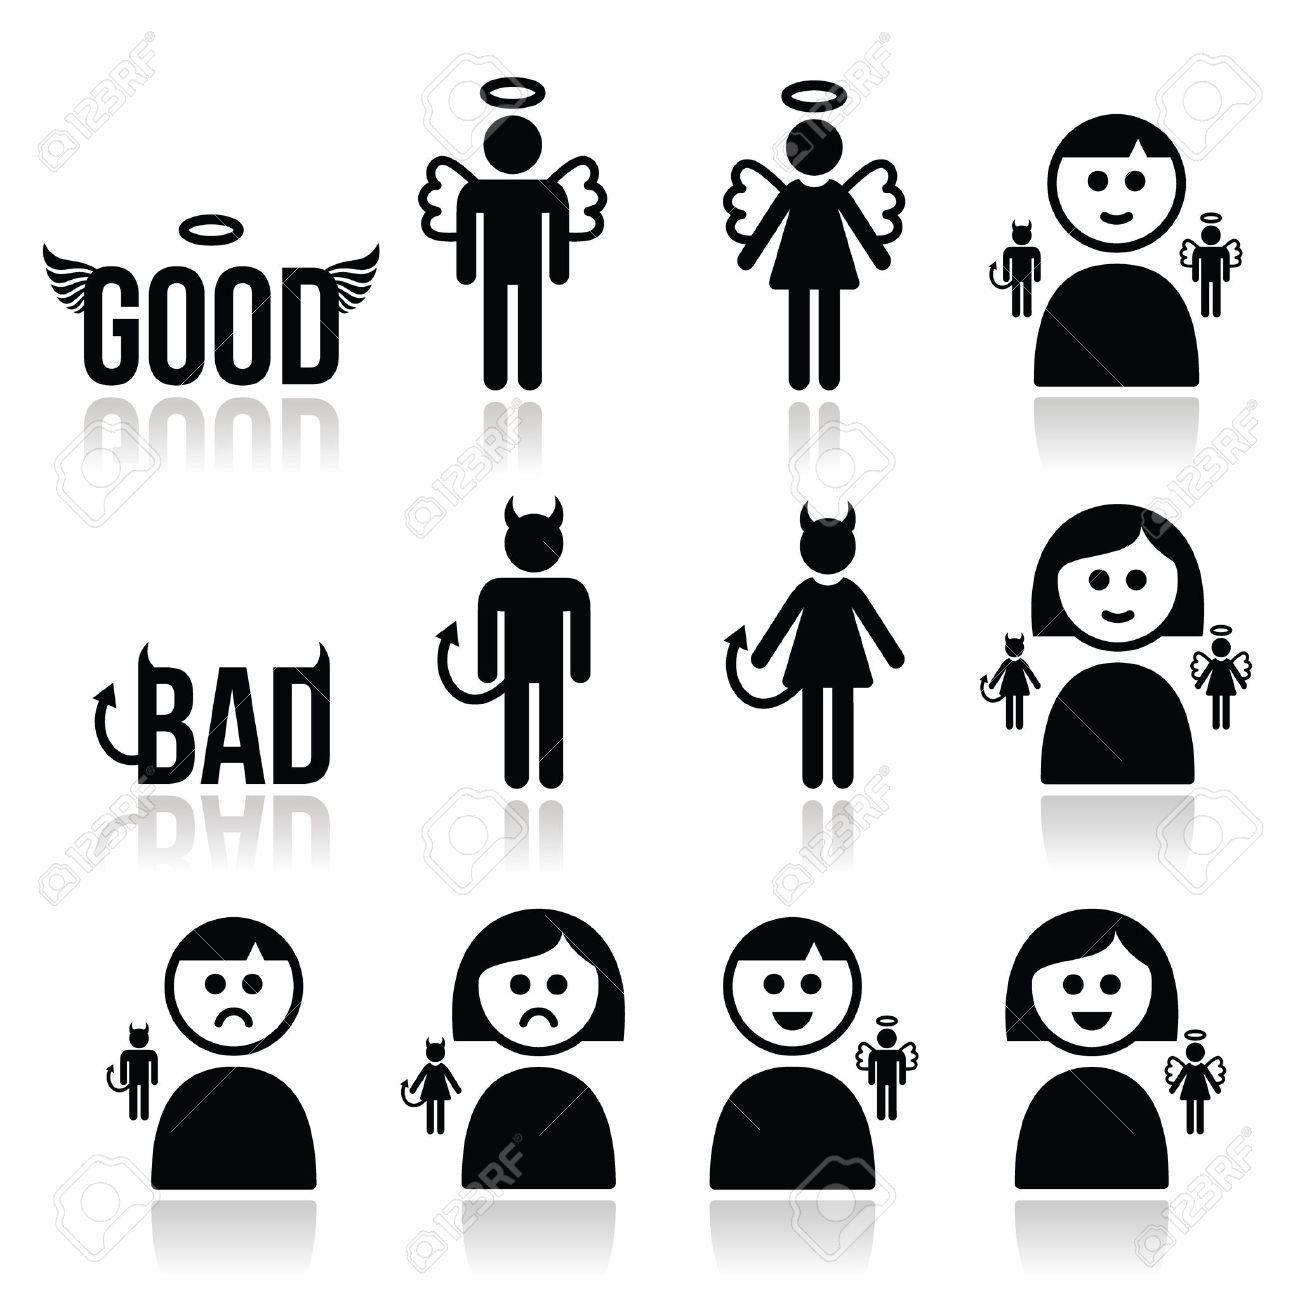 Angel, devil man and woman icon set - 32606499